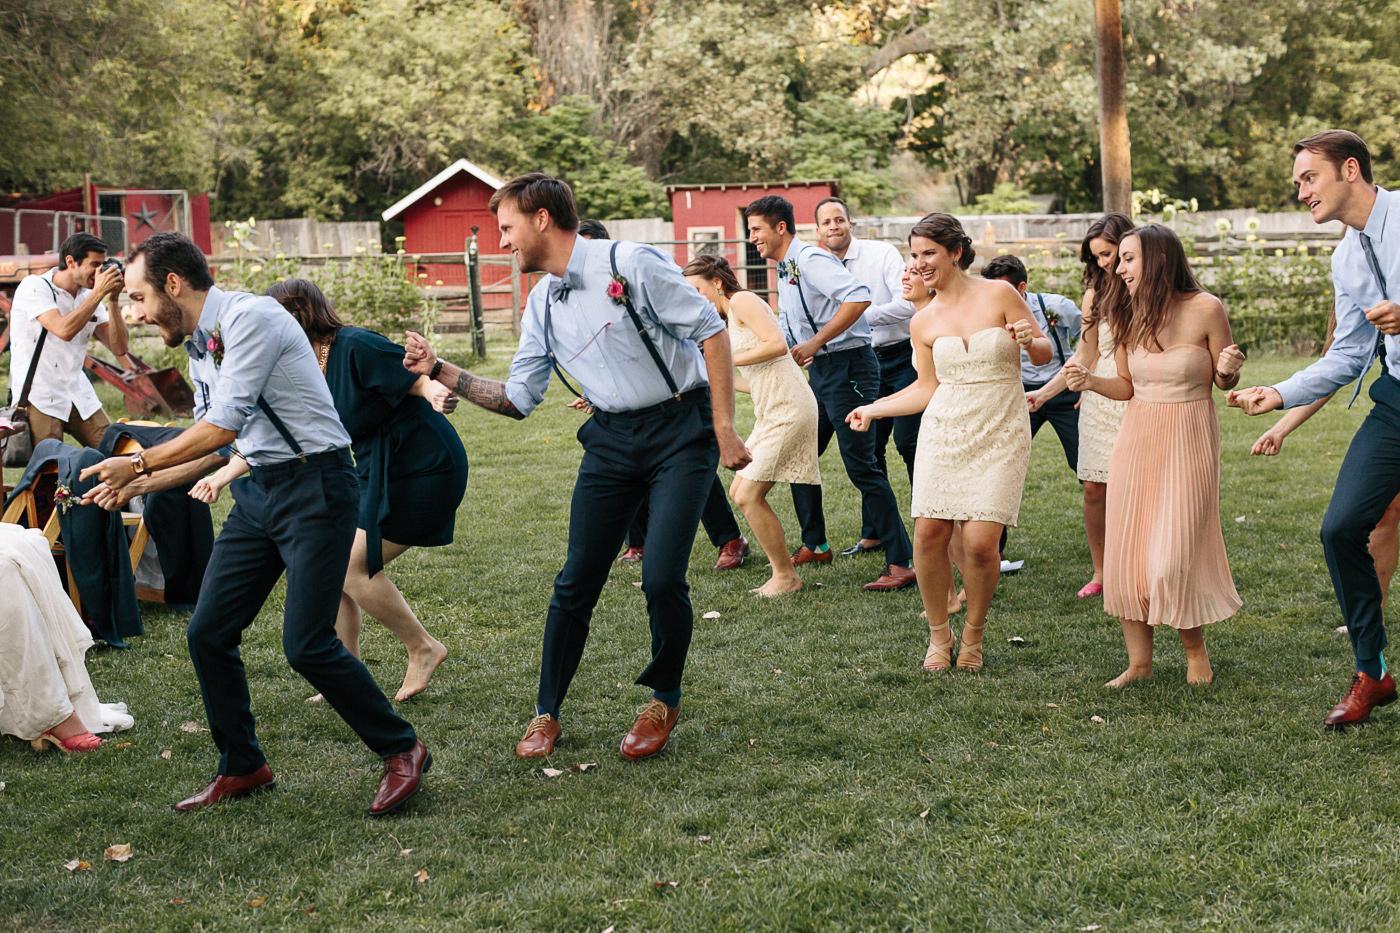 Lyons-Farmette-Wedding-Photographer-Lucy-Austin-Flash-Mob-Dance-49.jpg